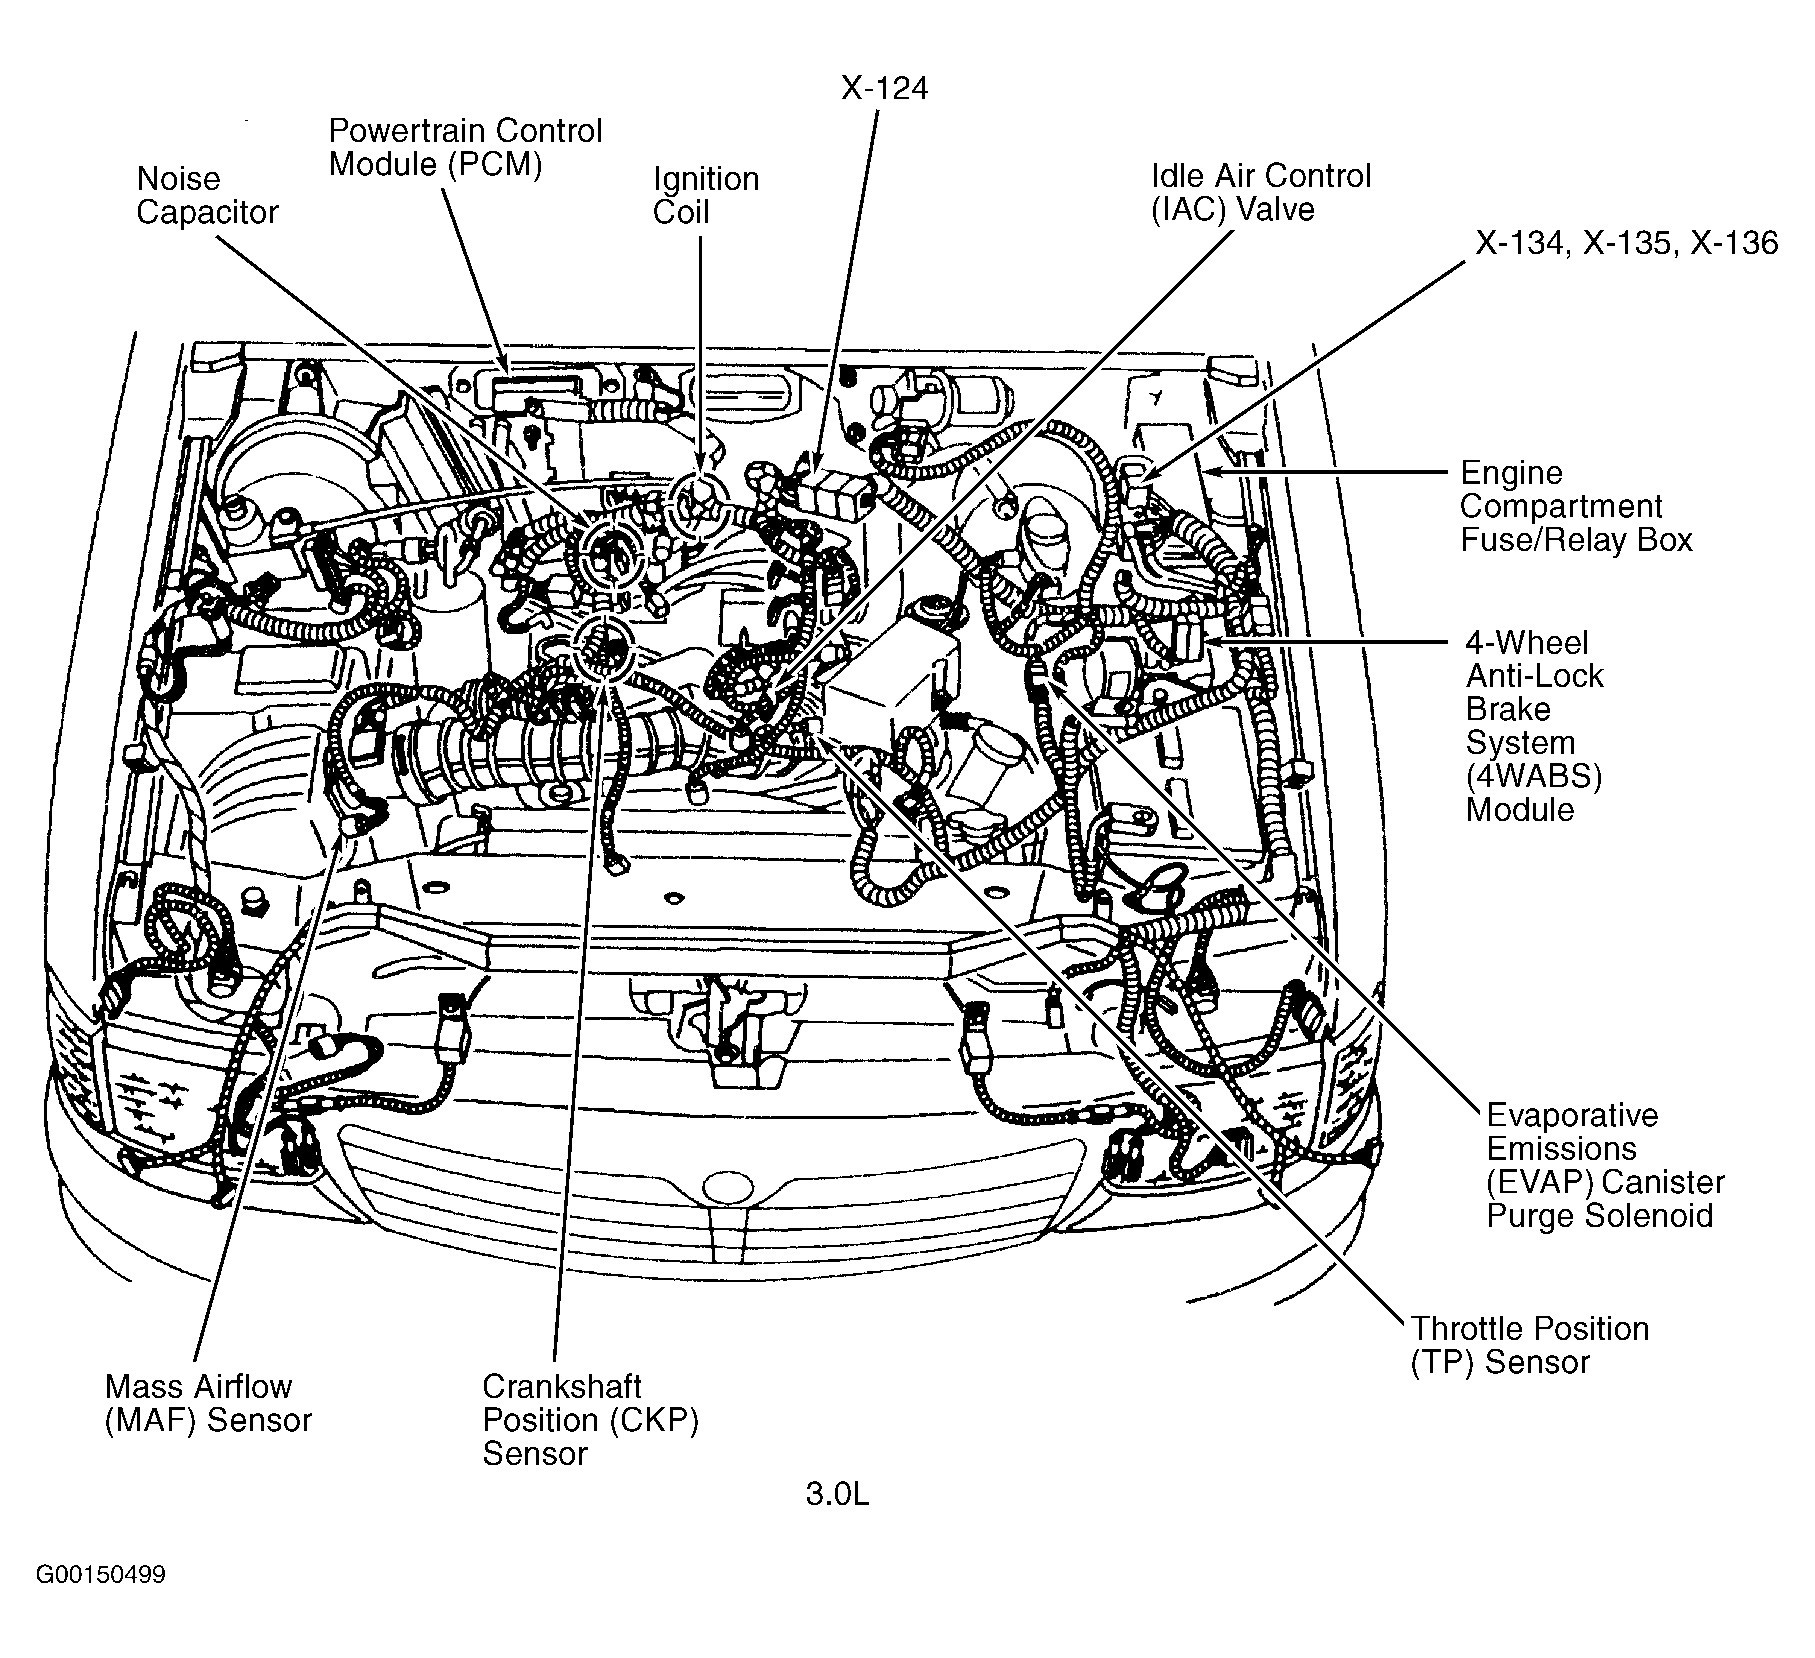 2010 Dodge Charger Engine Diagram 2008 Dodge Caliber Engine Diagram Wiring Diagram Used Of 2010 Dodge Charger Engine Diagram